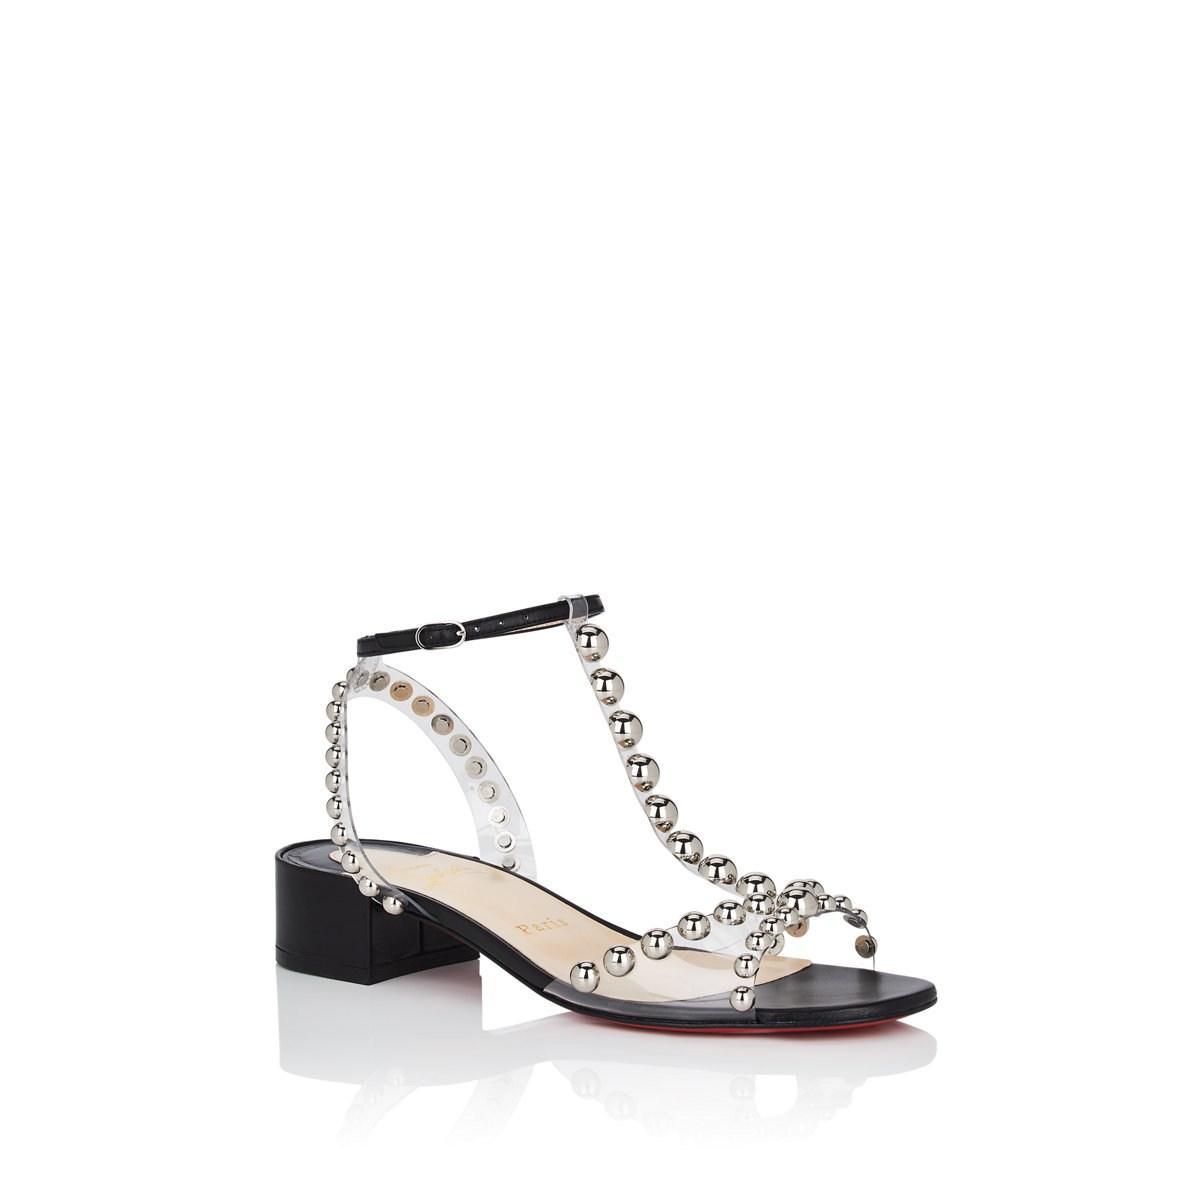 64753c1685ac Lyst - Christian Louboutin Faridaravie Studded Leather   Pvc Sandals ...